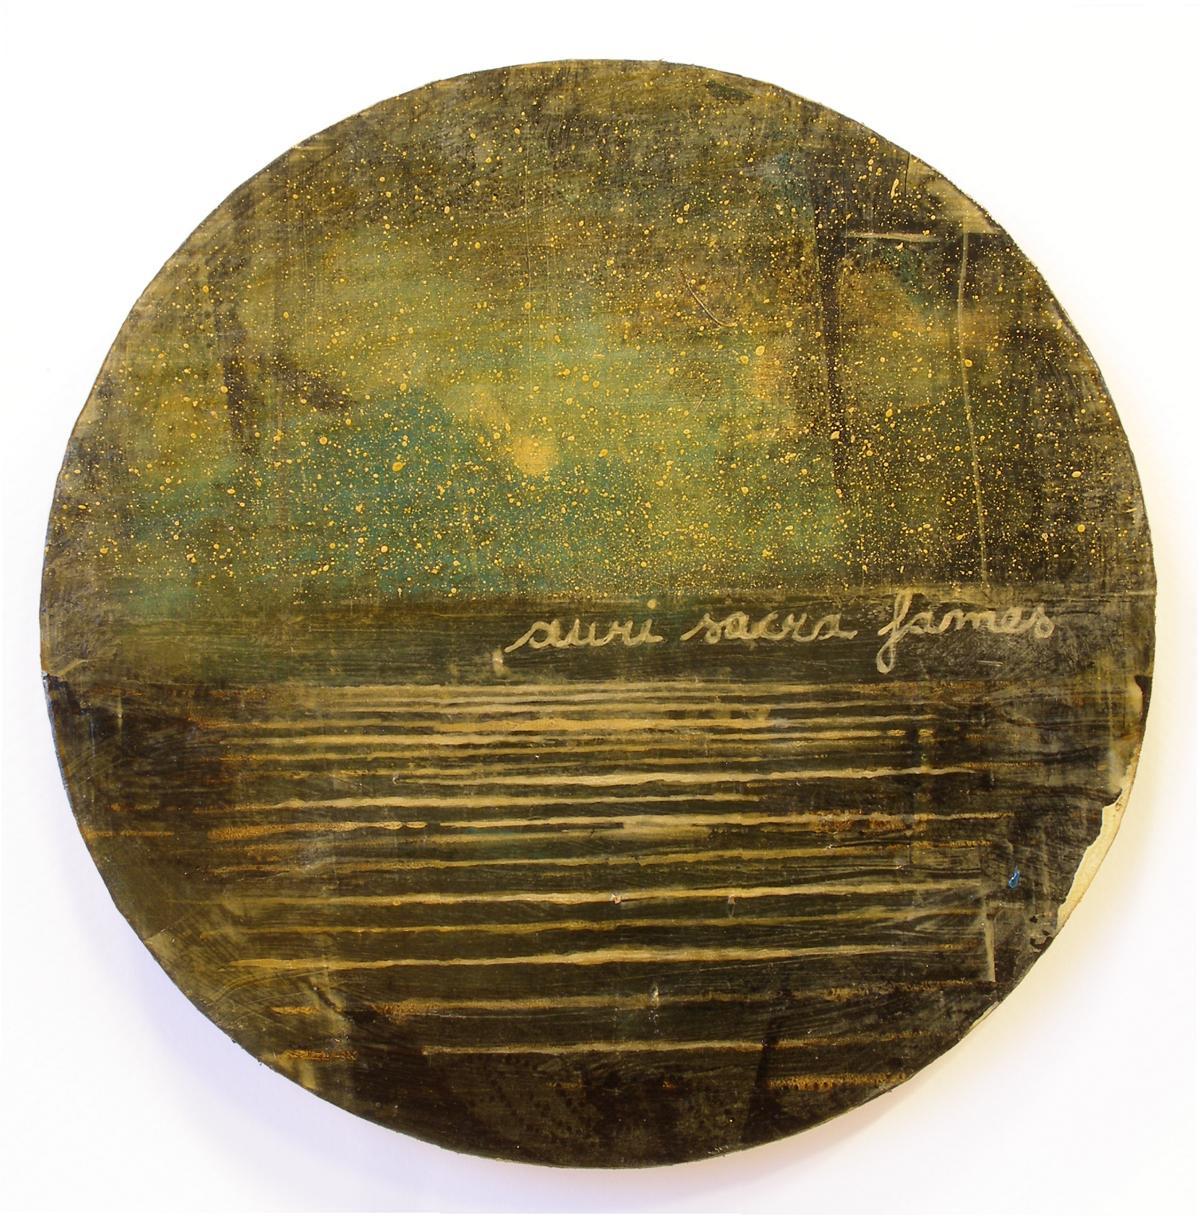 Jernej Forbici, Auri sacra fames VI, diametro 20 cm, 2017. acrilico e olio su carta